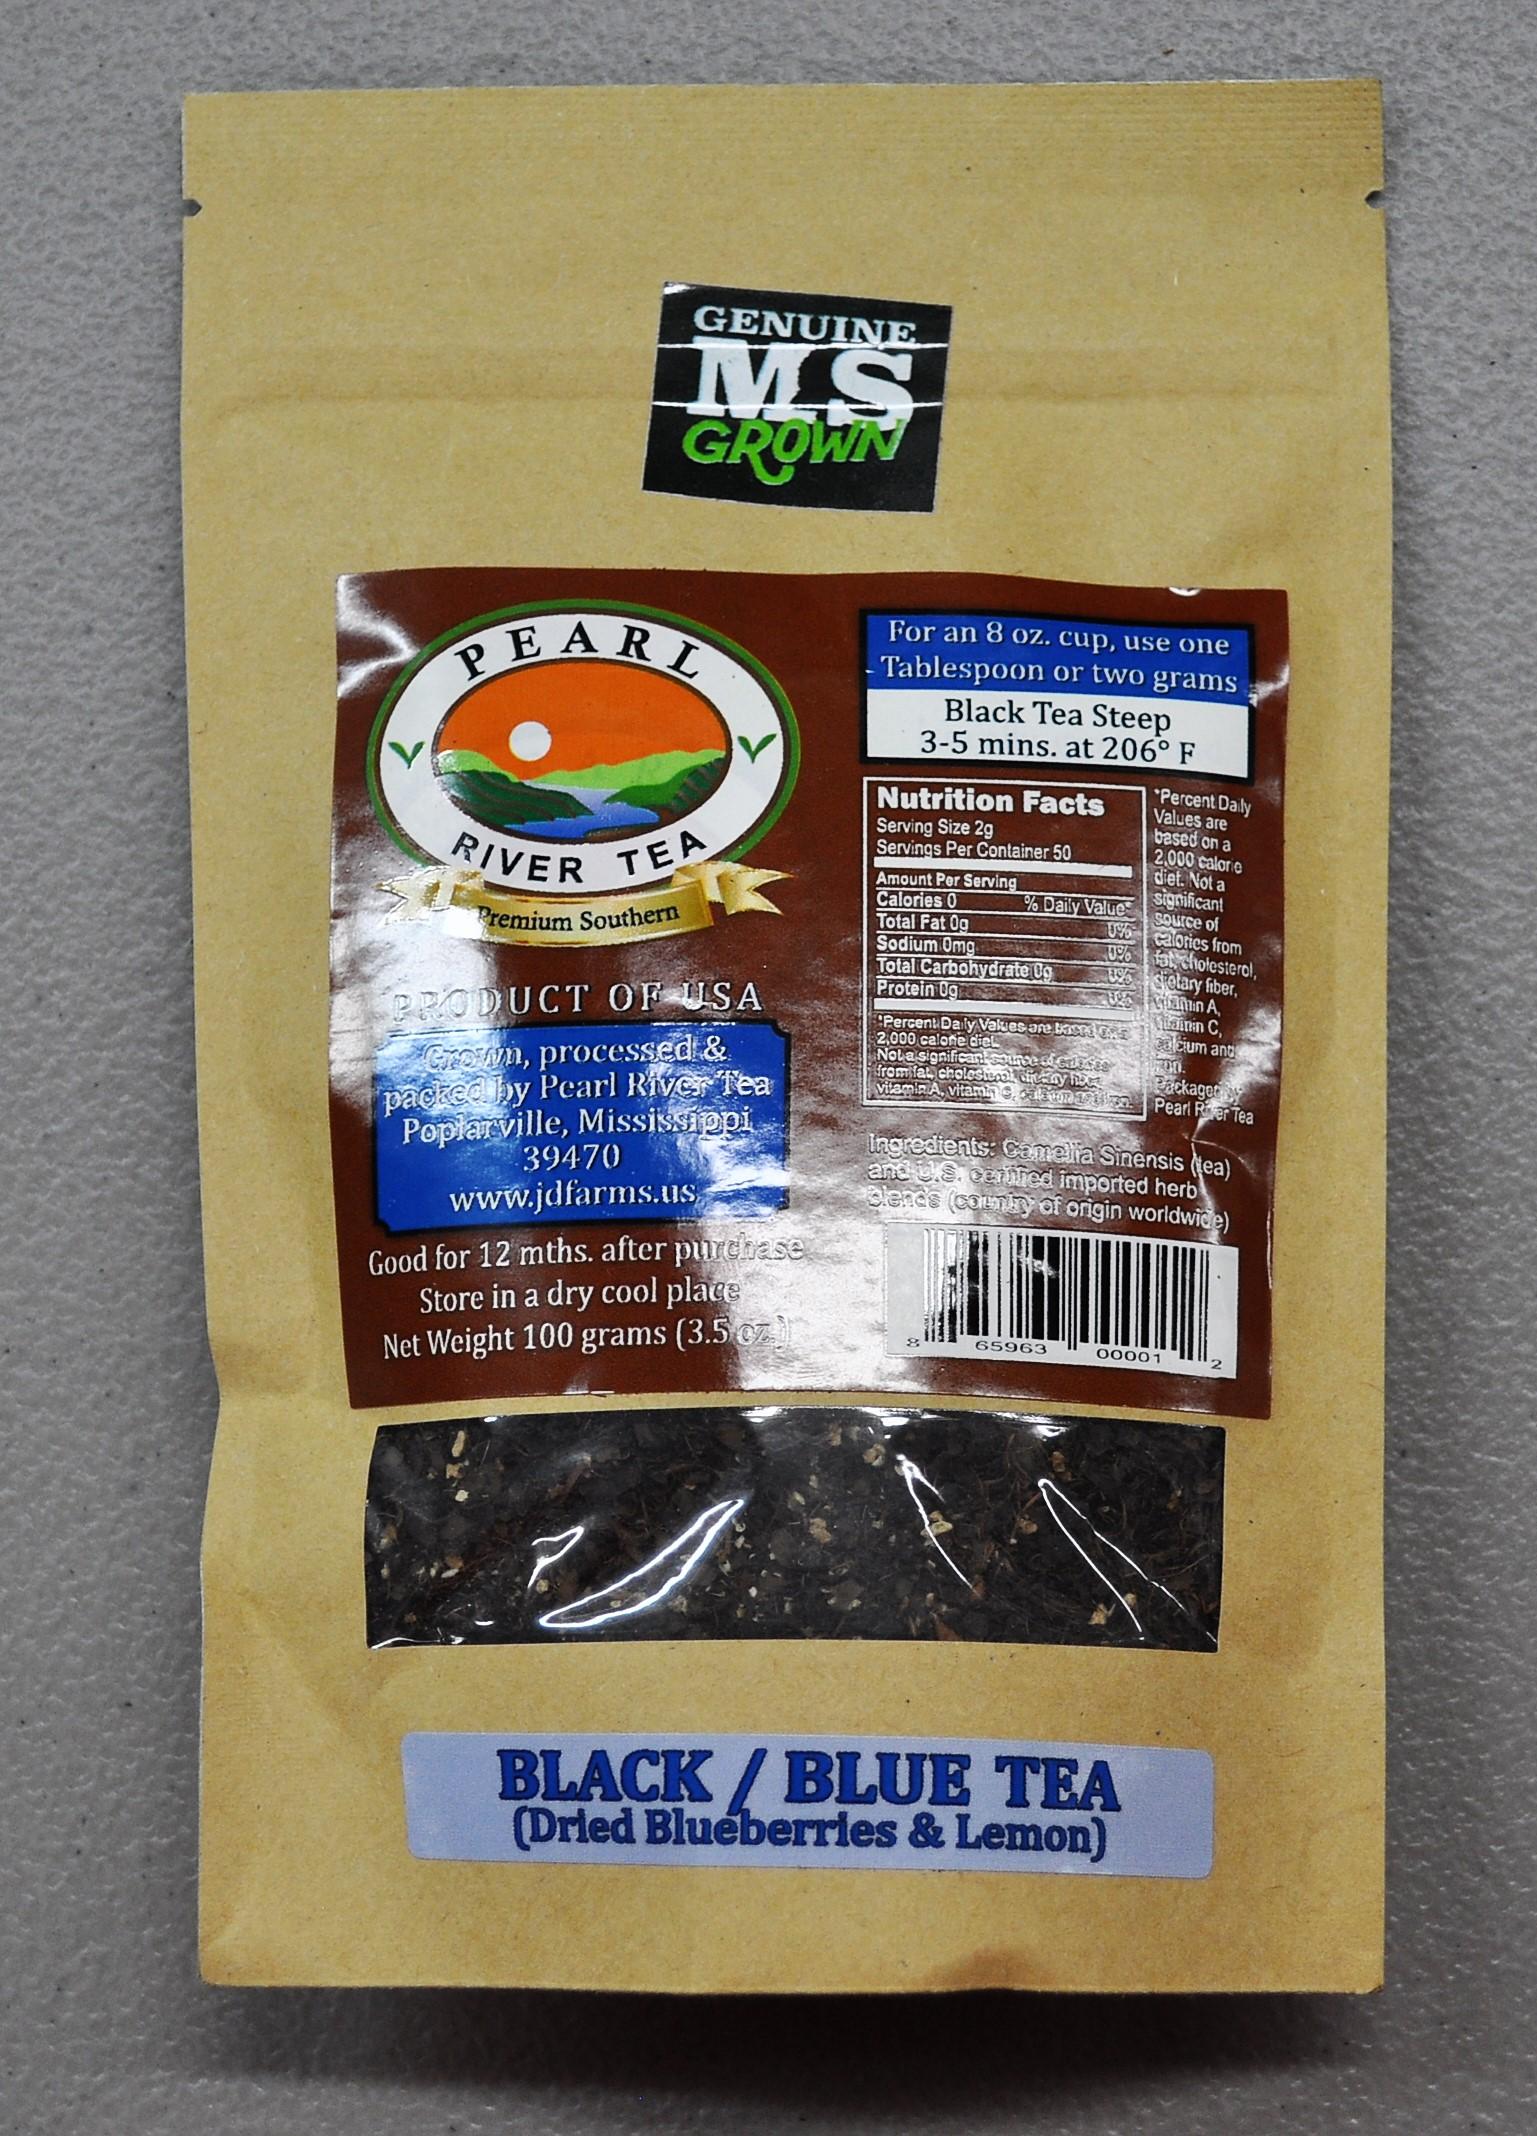 black blue tea jd farms us mississippi s blueberry farm